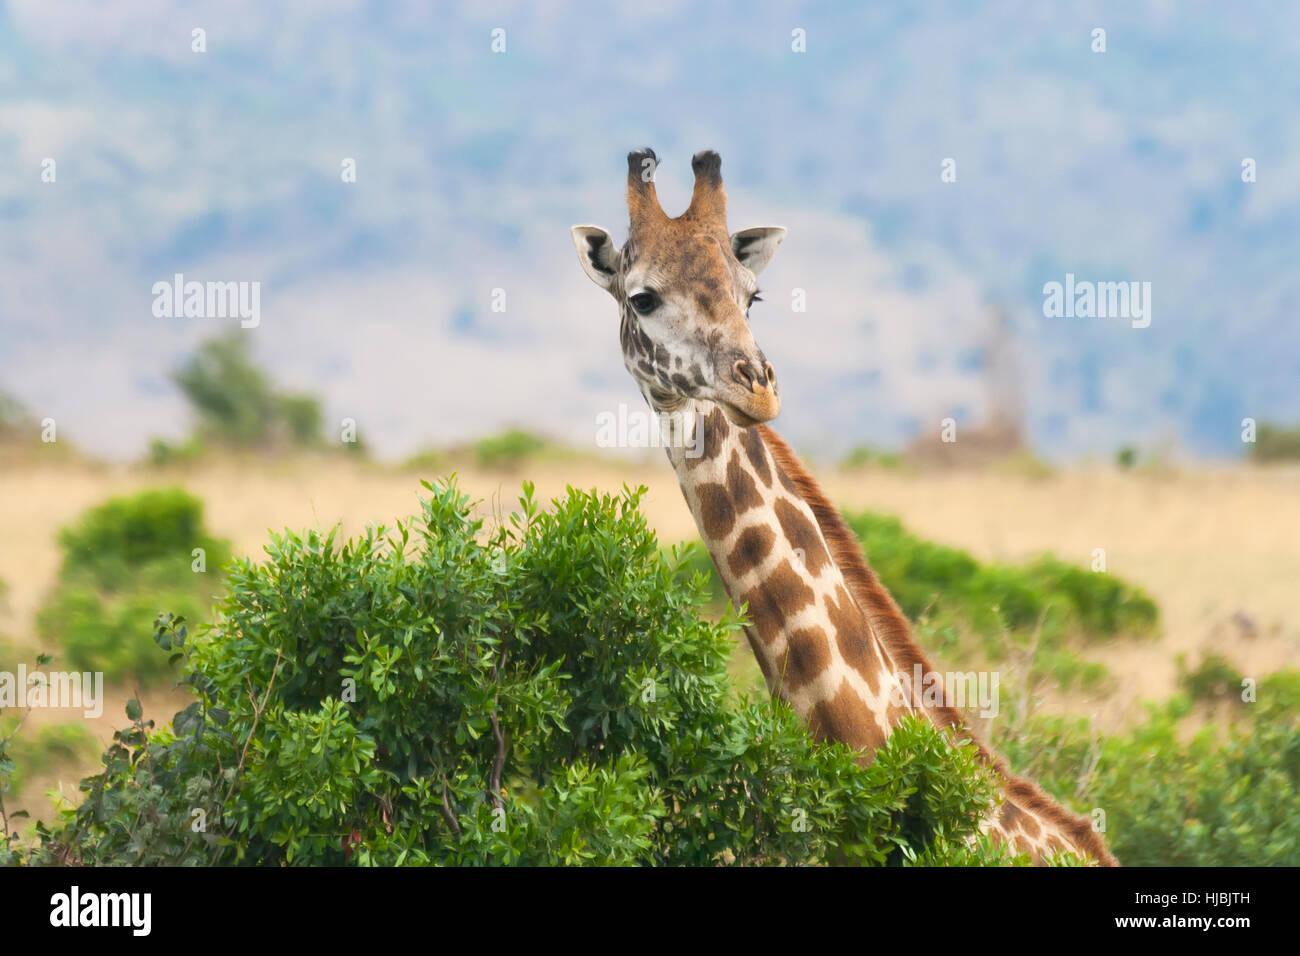 Fermer la vue de girafes à Masai Mara National Reserve, Kenya Photo Stock